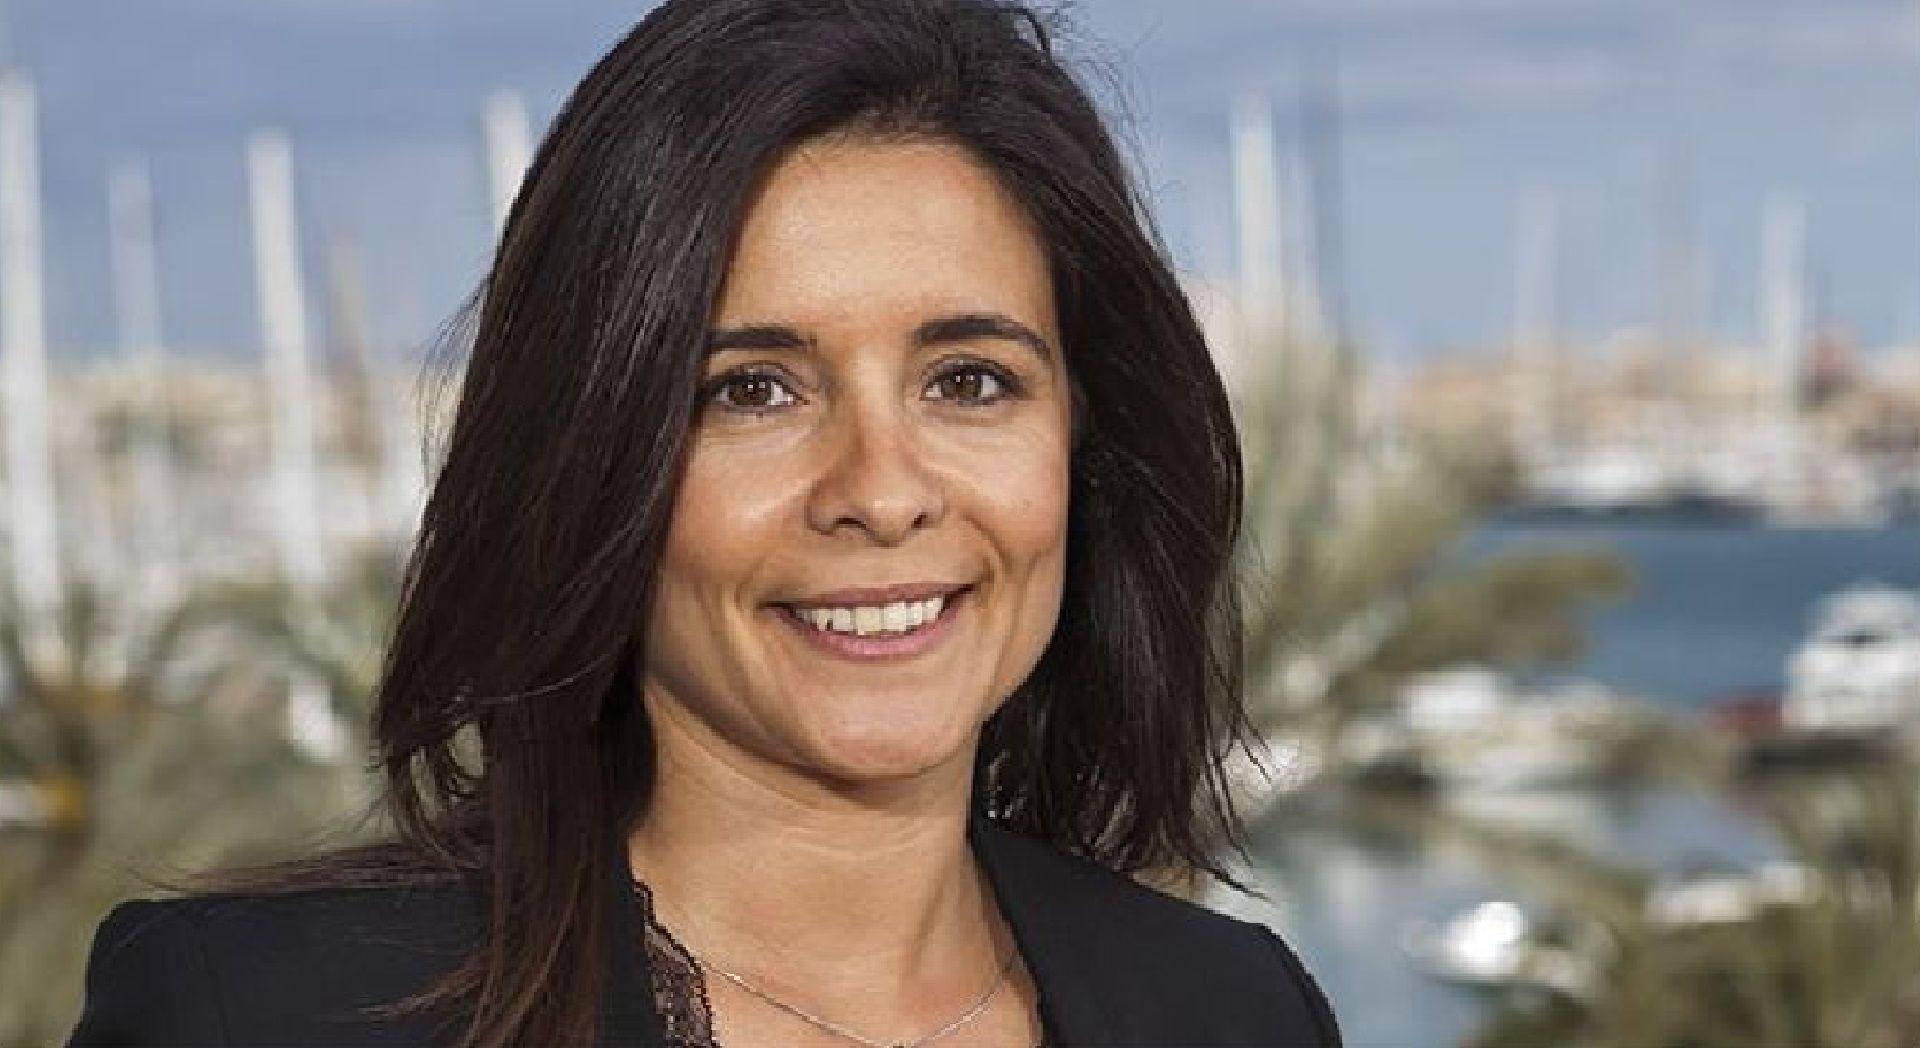 Natalia Seoane es de Sada (A Coruña) y dirige dos hoteles Meliá en Palma de Mallorca